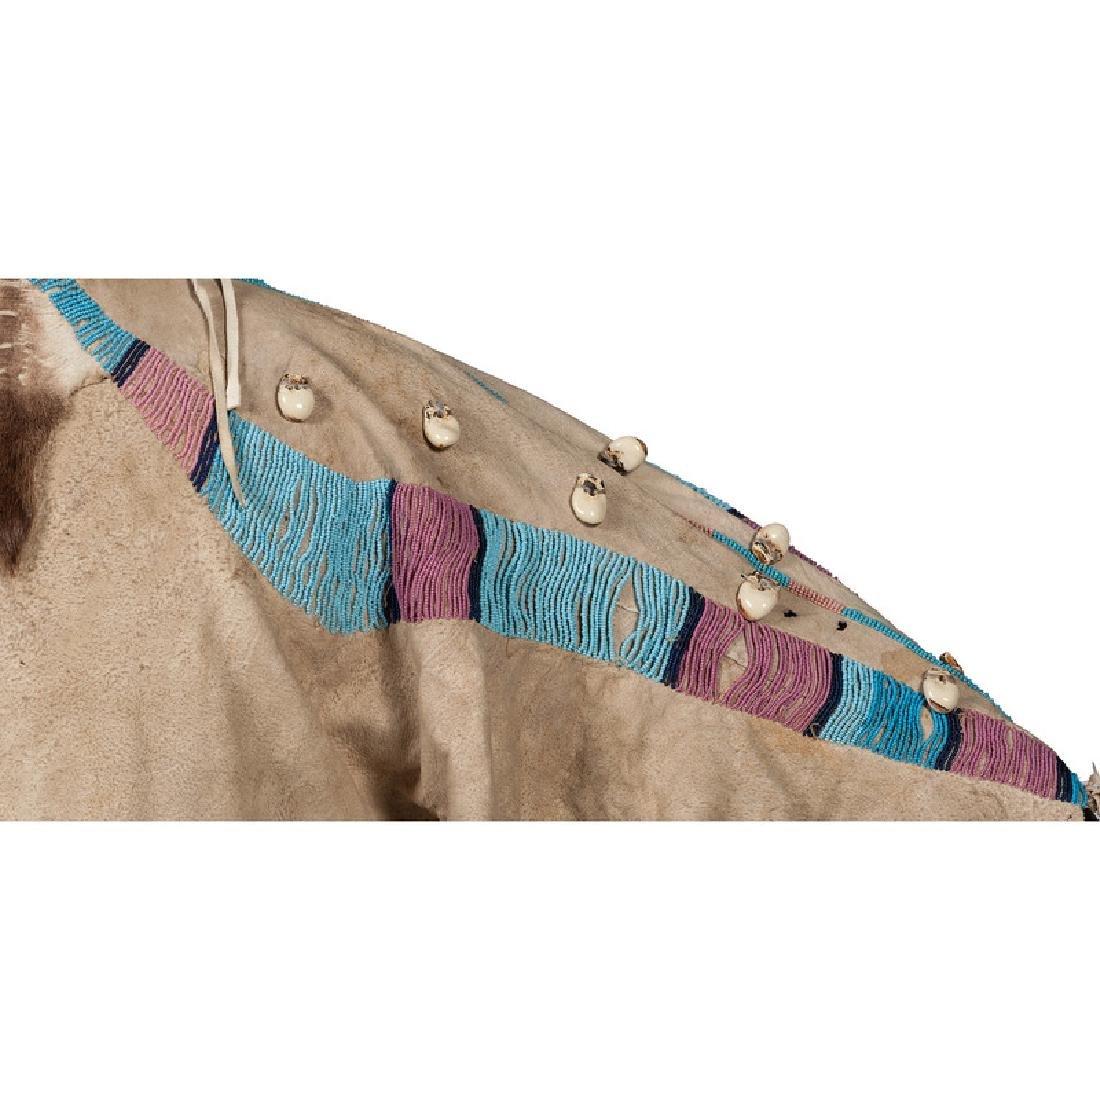 Nez Perce Beaded Hide Dress - 3